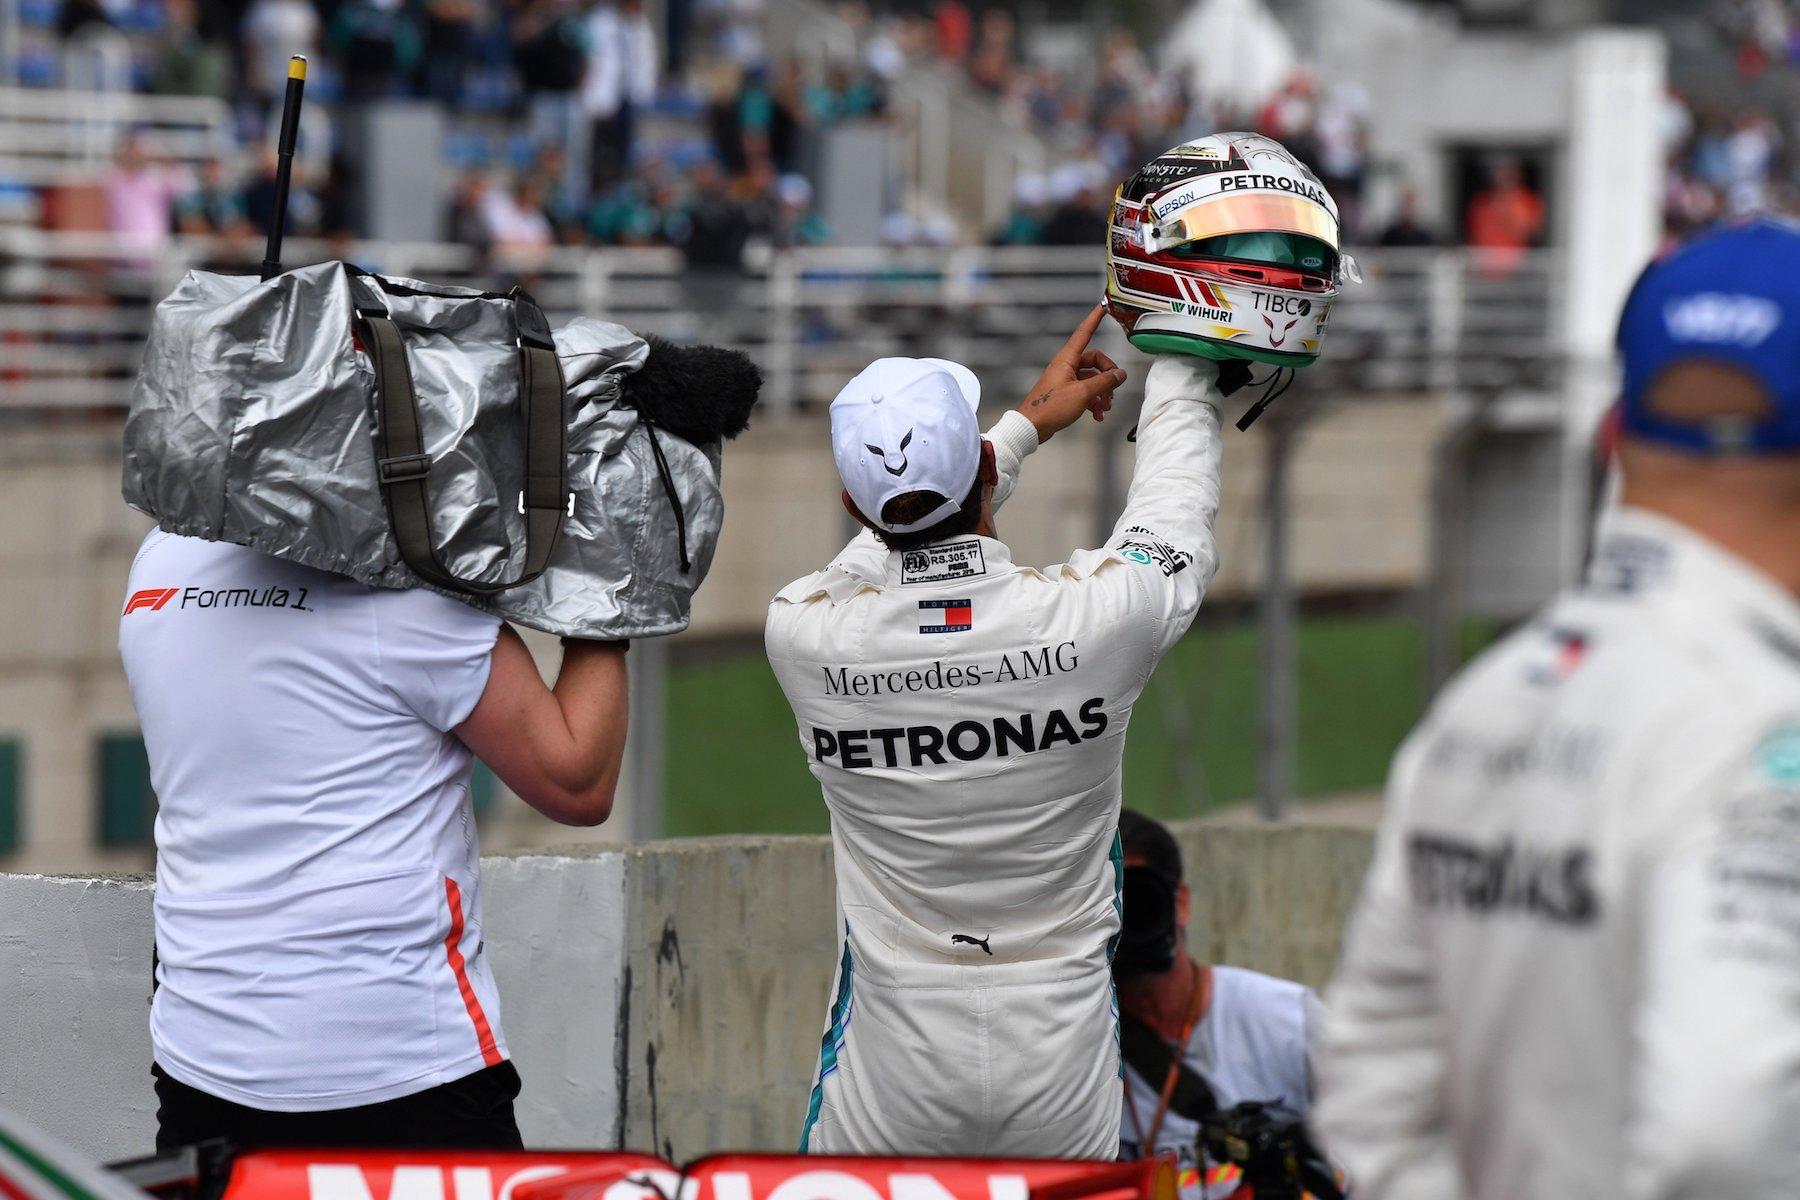 4 2018 Lewis Hamilton | Mercedes W09 | 2018 Brazilian GP Q3 Pole 2 copy.jpg